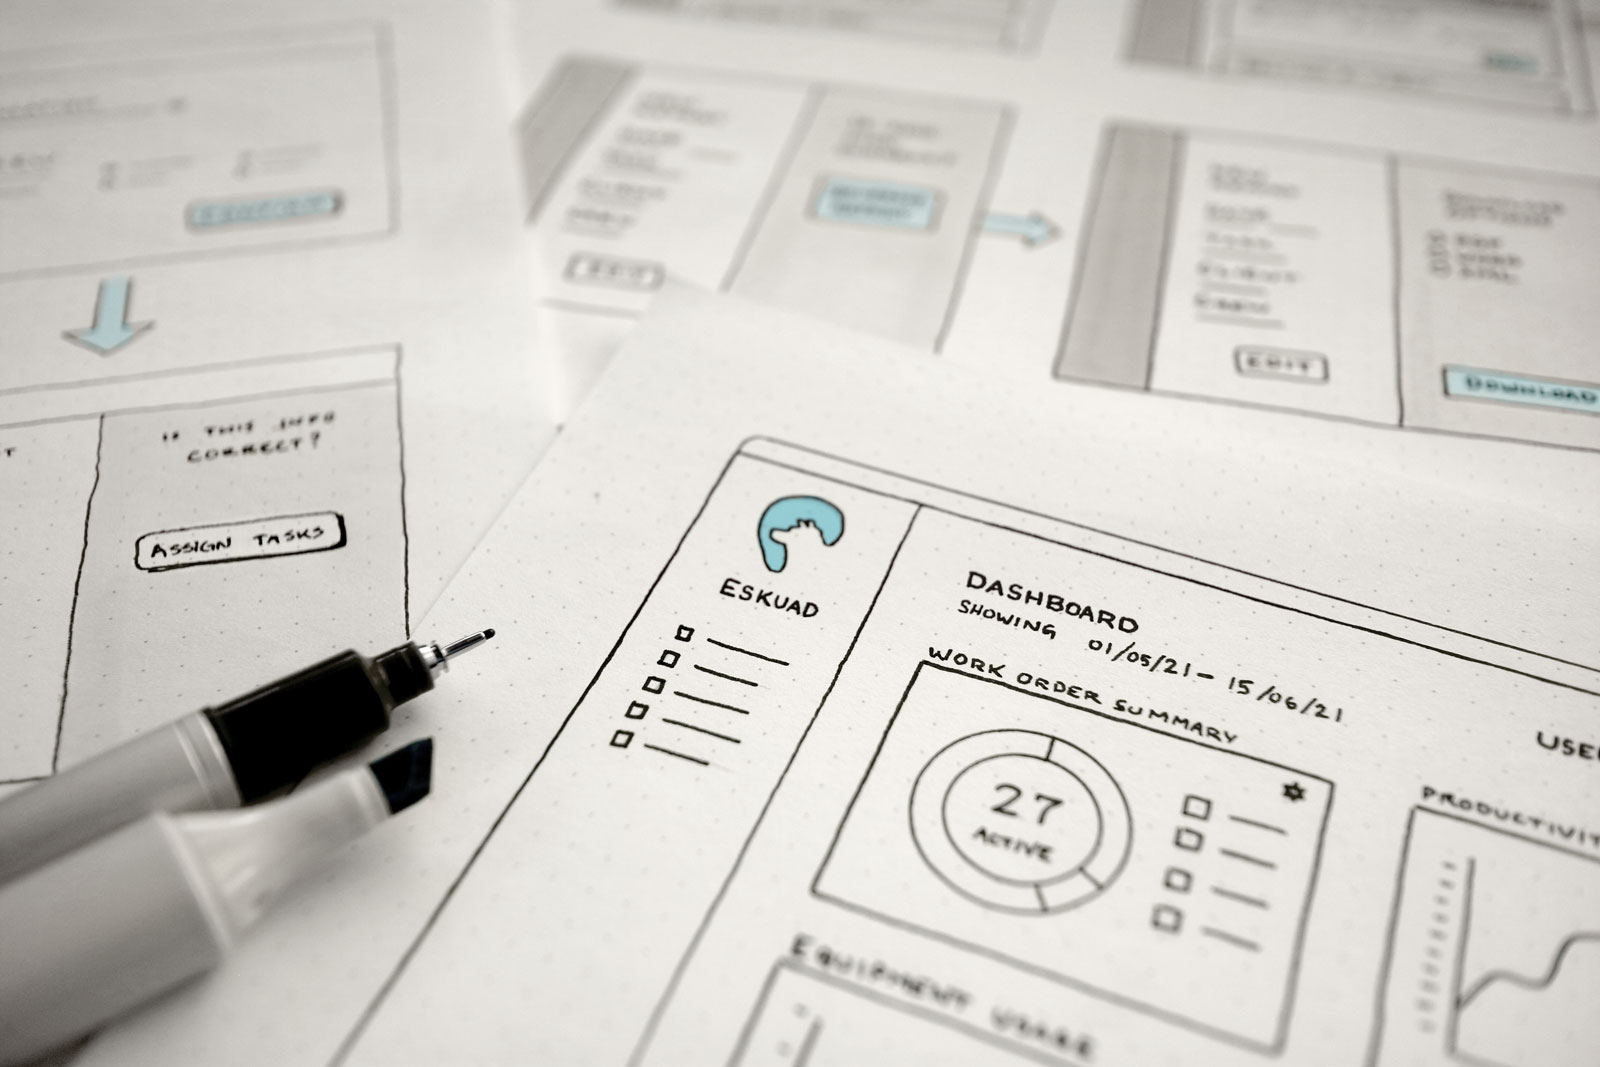 Sketches of UI ideas.